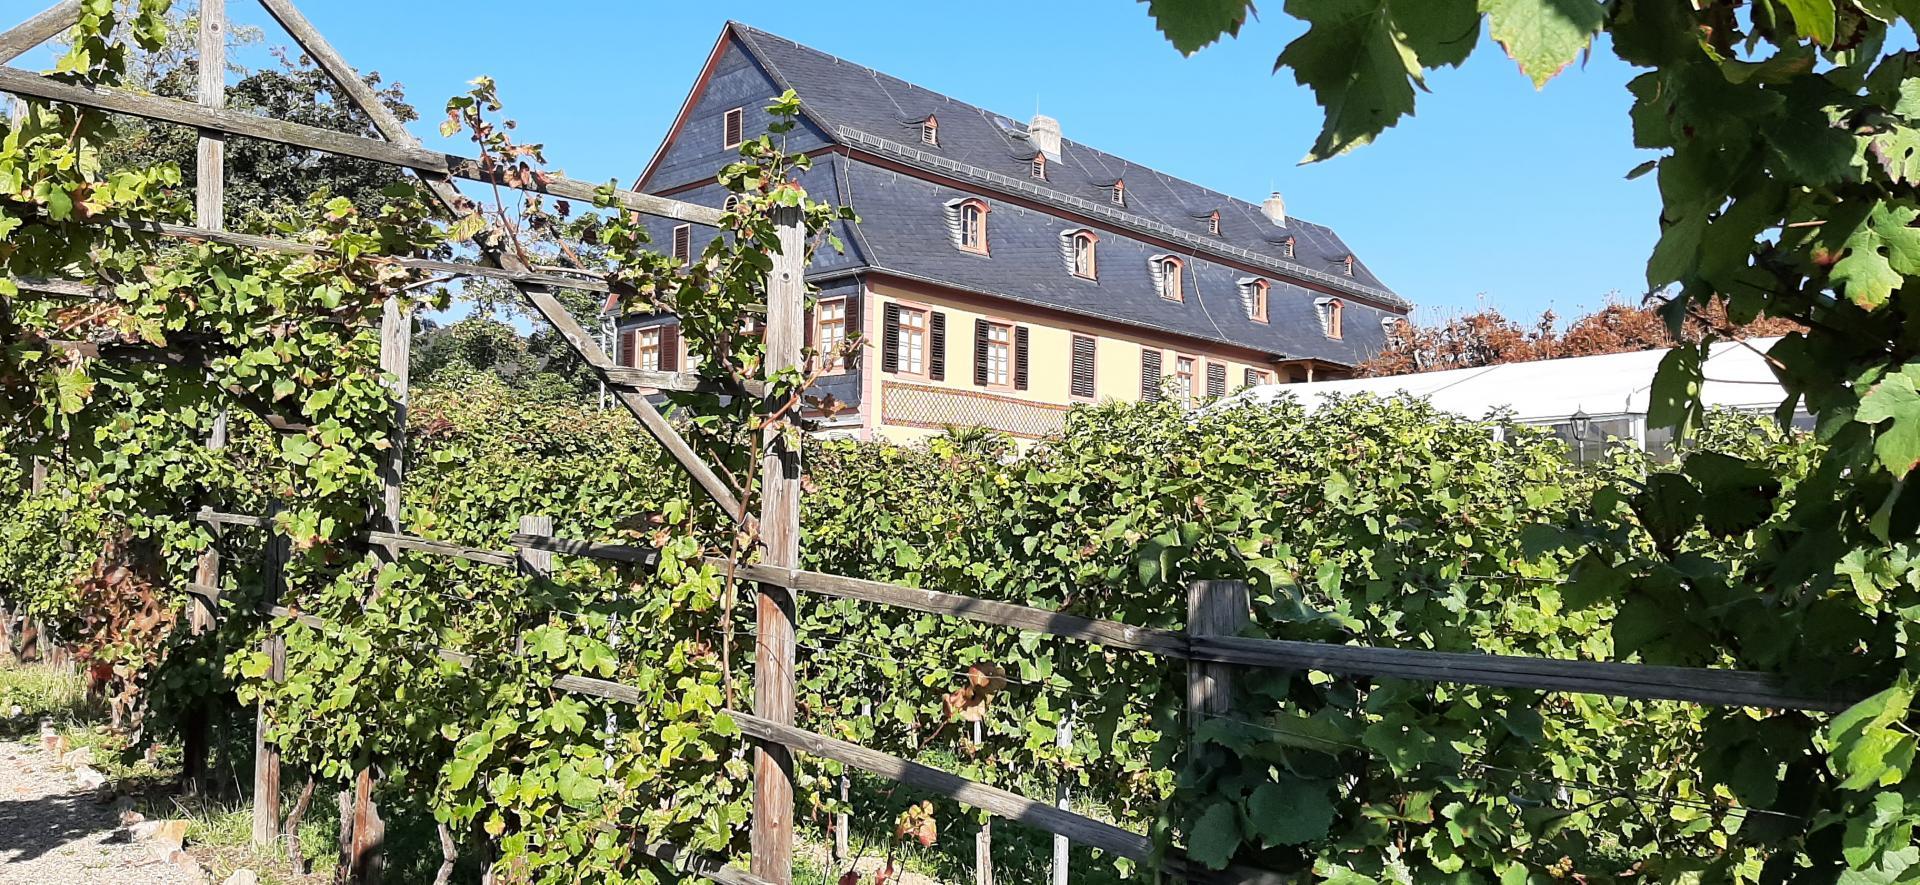 Brentanohaus